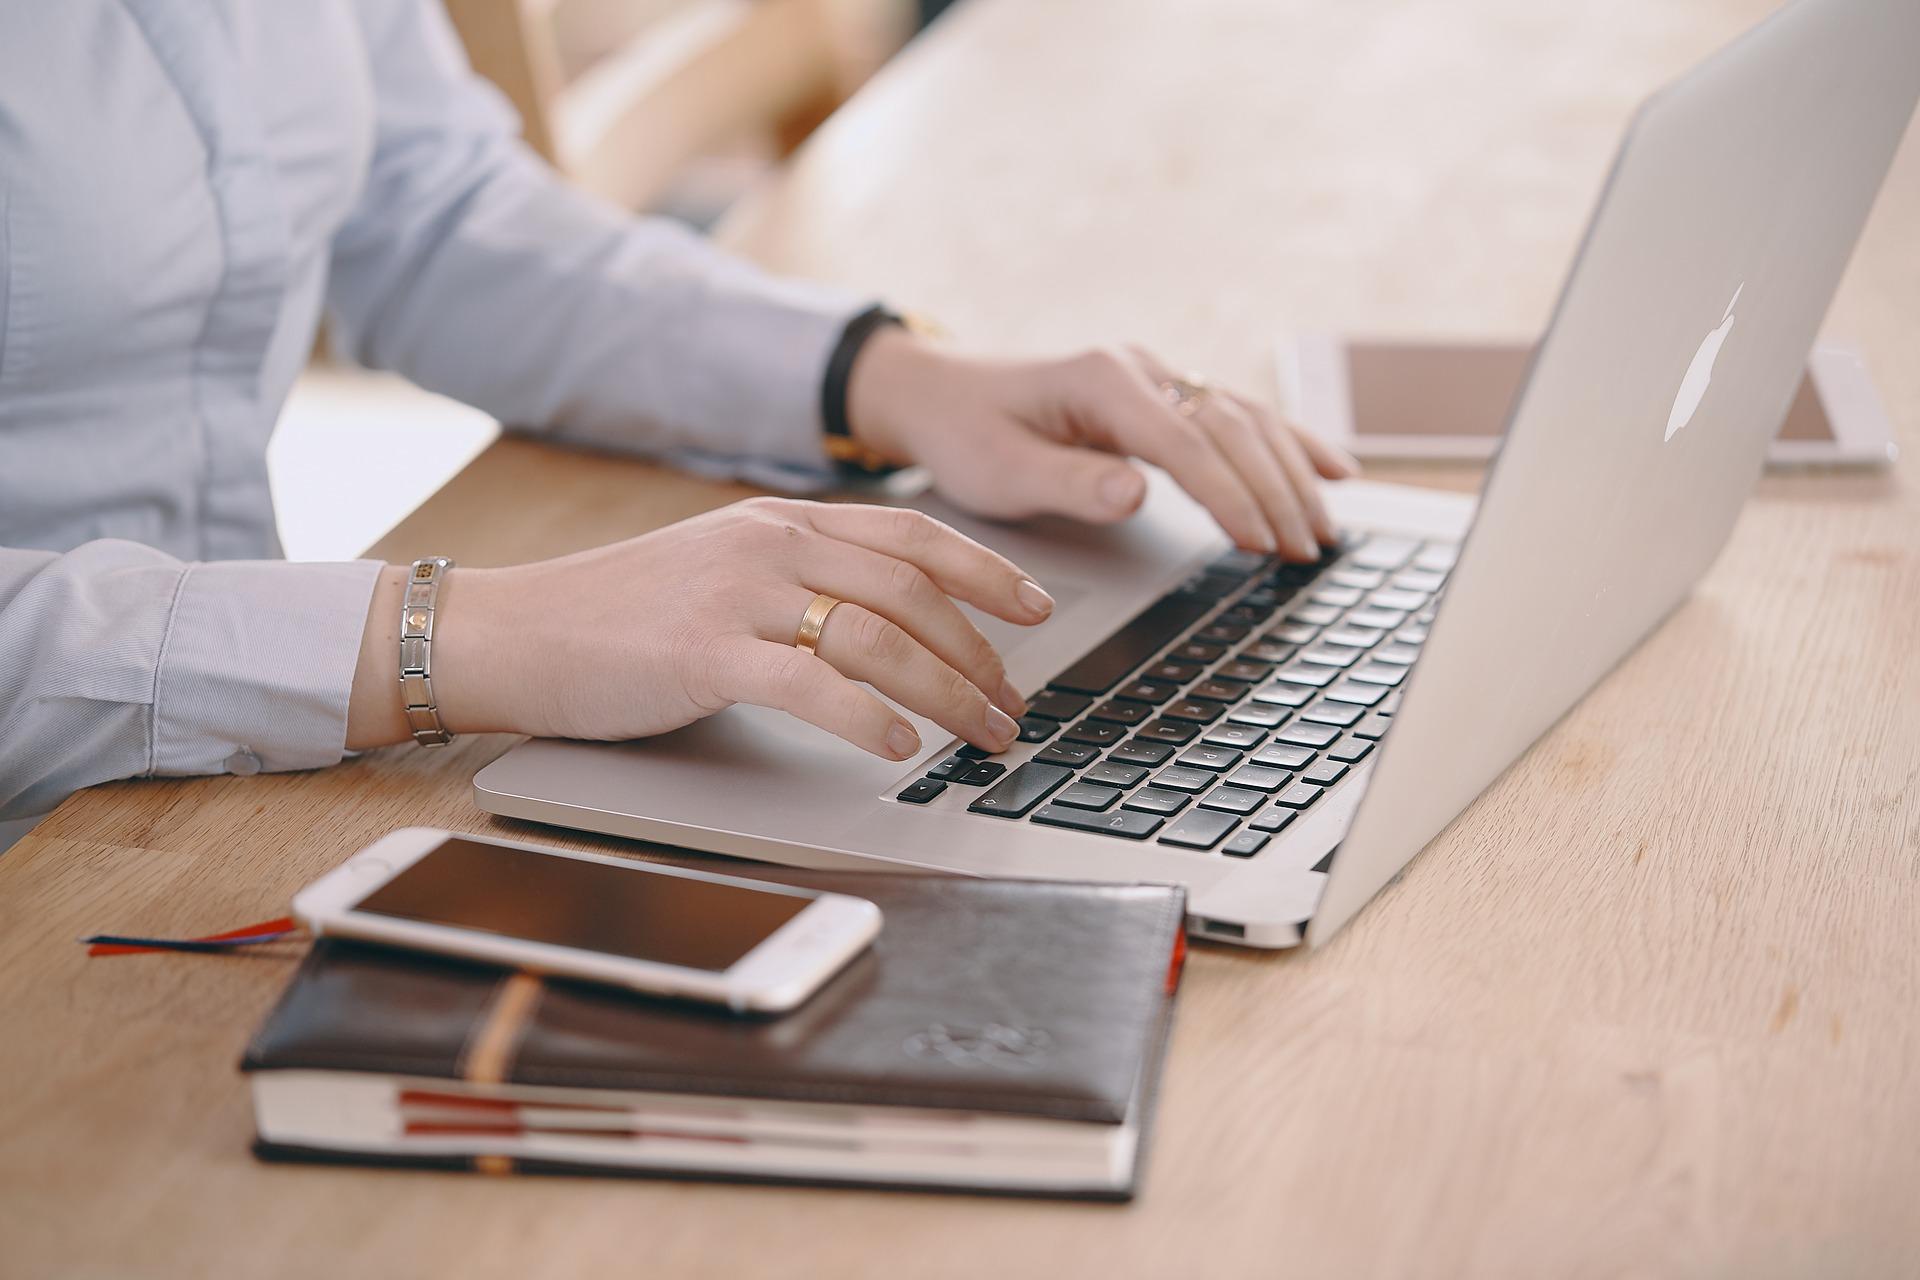 Žena kuca na laptopu